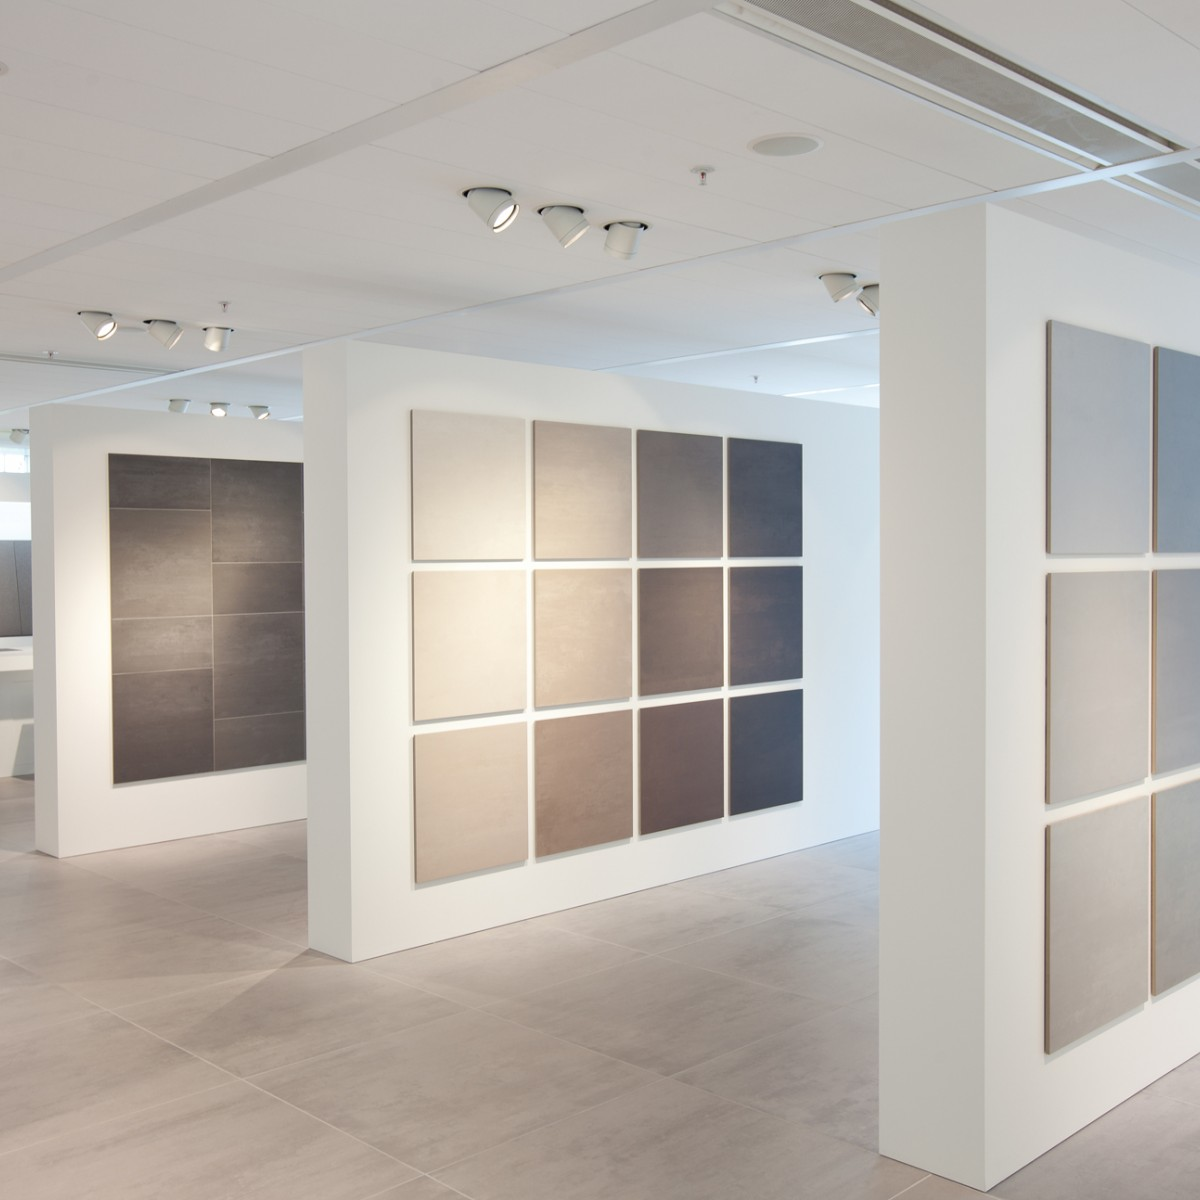 Interior Design Studio Amsterdam design studio amsterdam > contact > view tile series